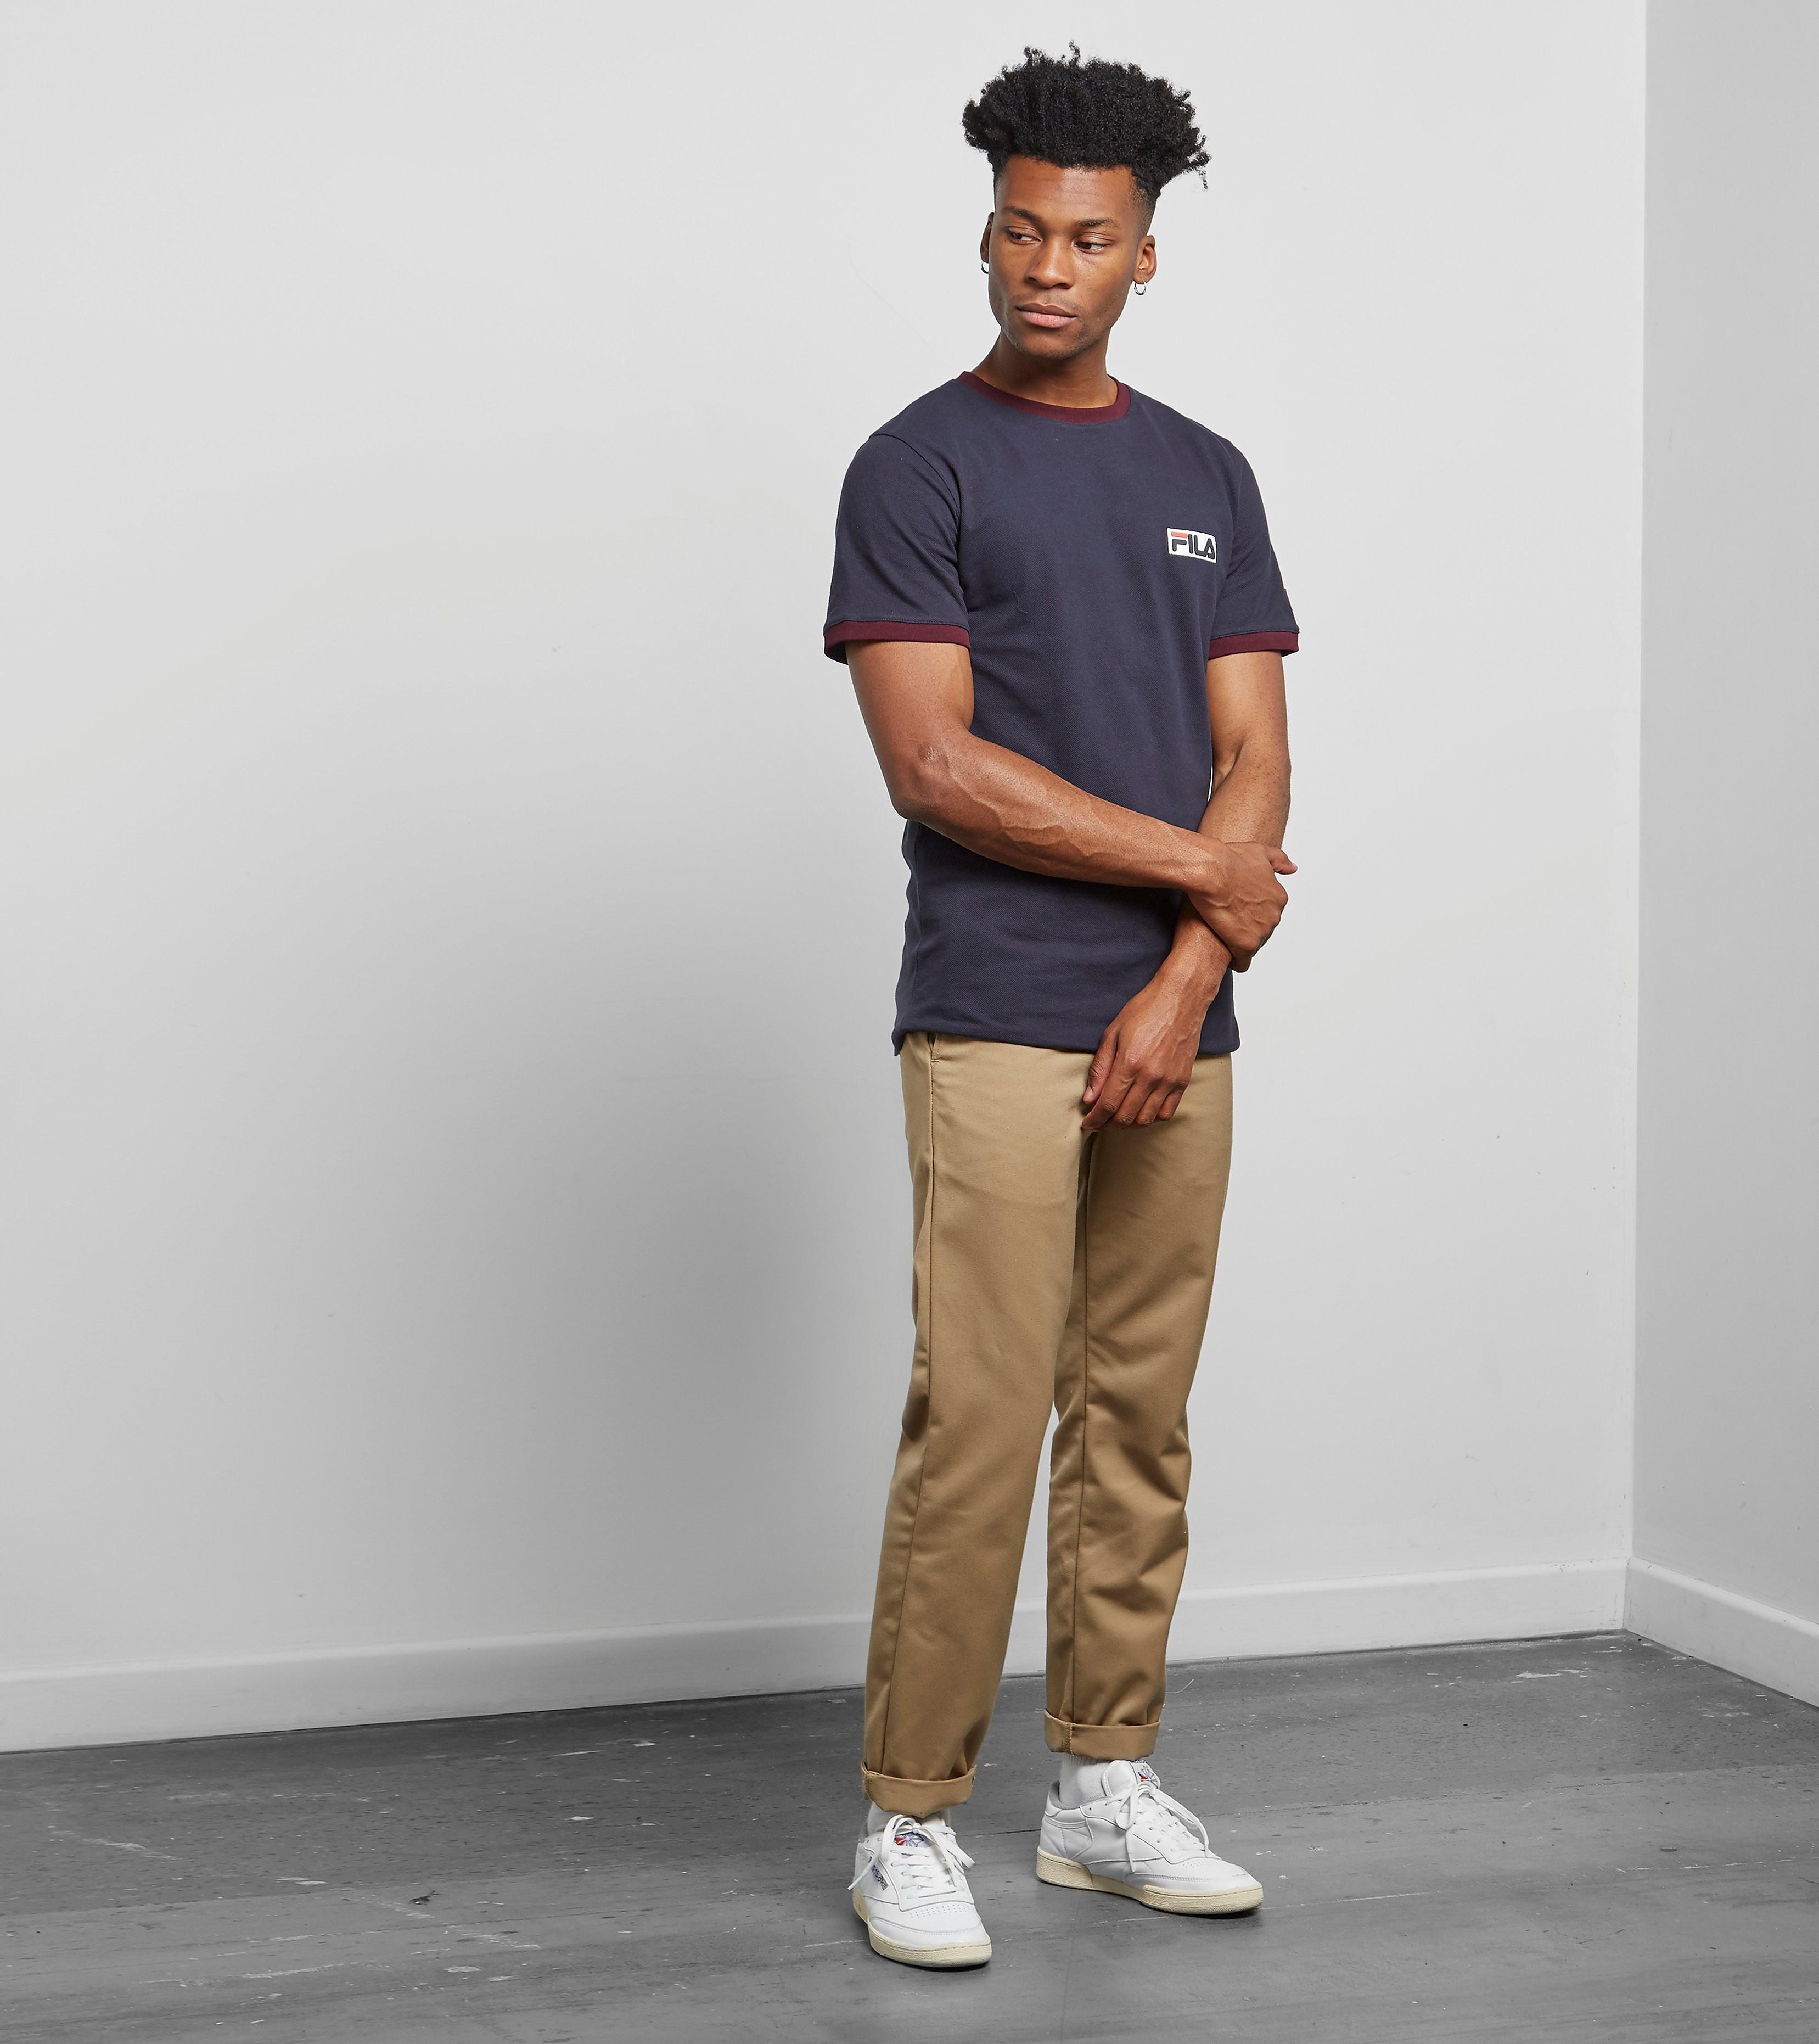 Fila Lathuile T-Shirt - size? Exclusive